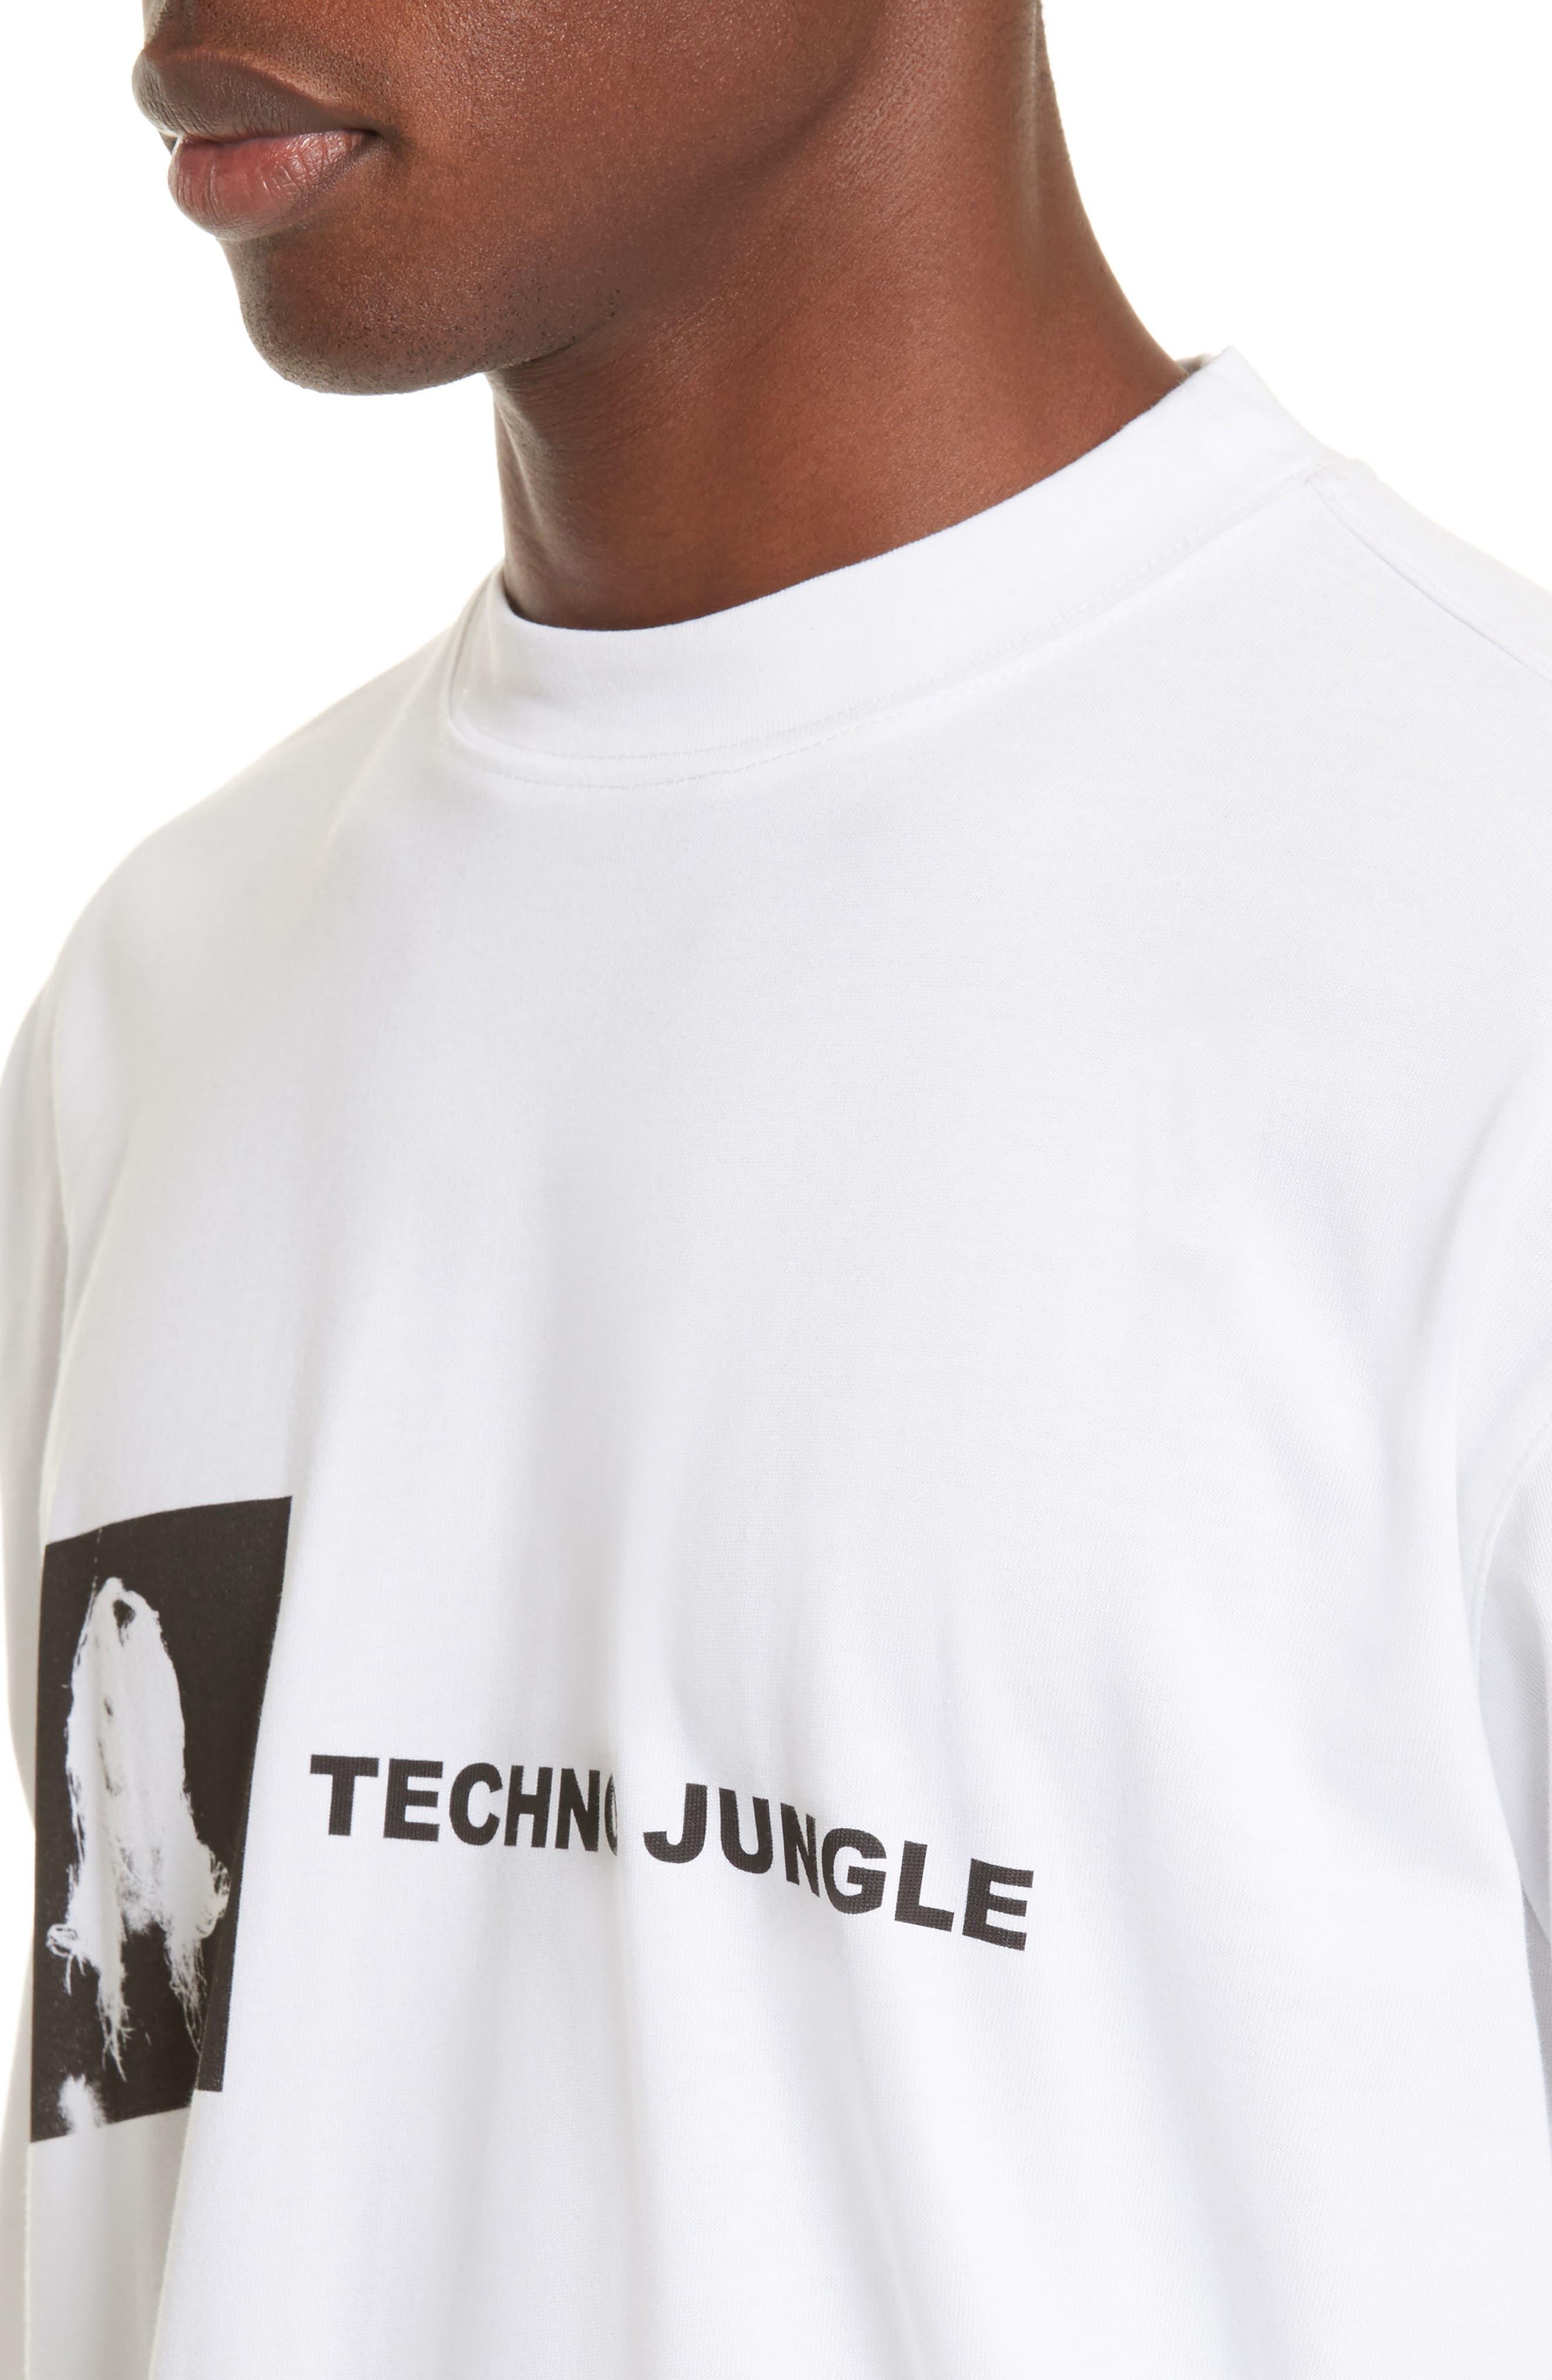 Techno Jungle Graphic T-Shirt,                             Alternate thumbnail 4, color,                             100